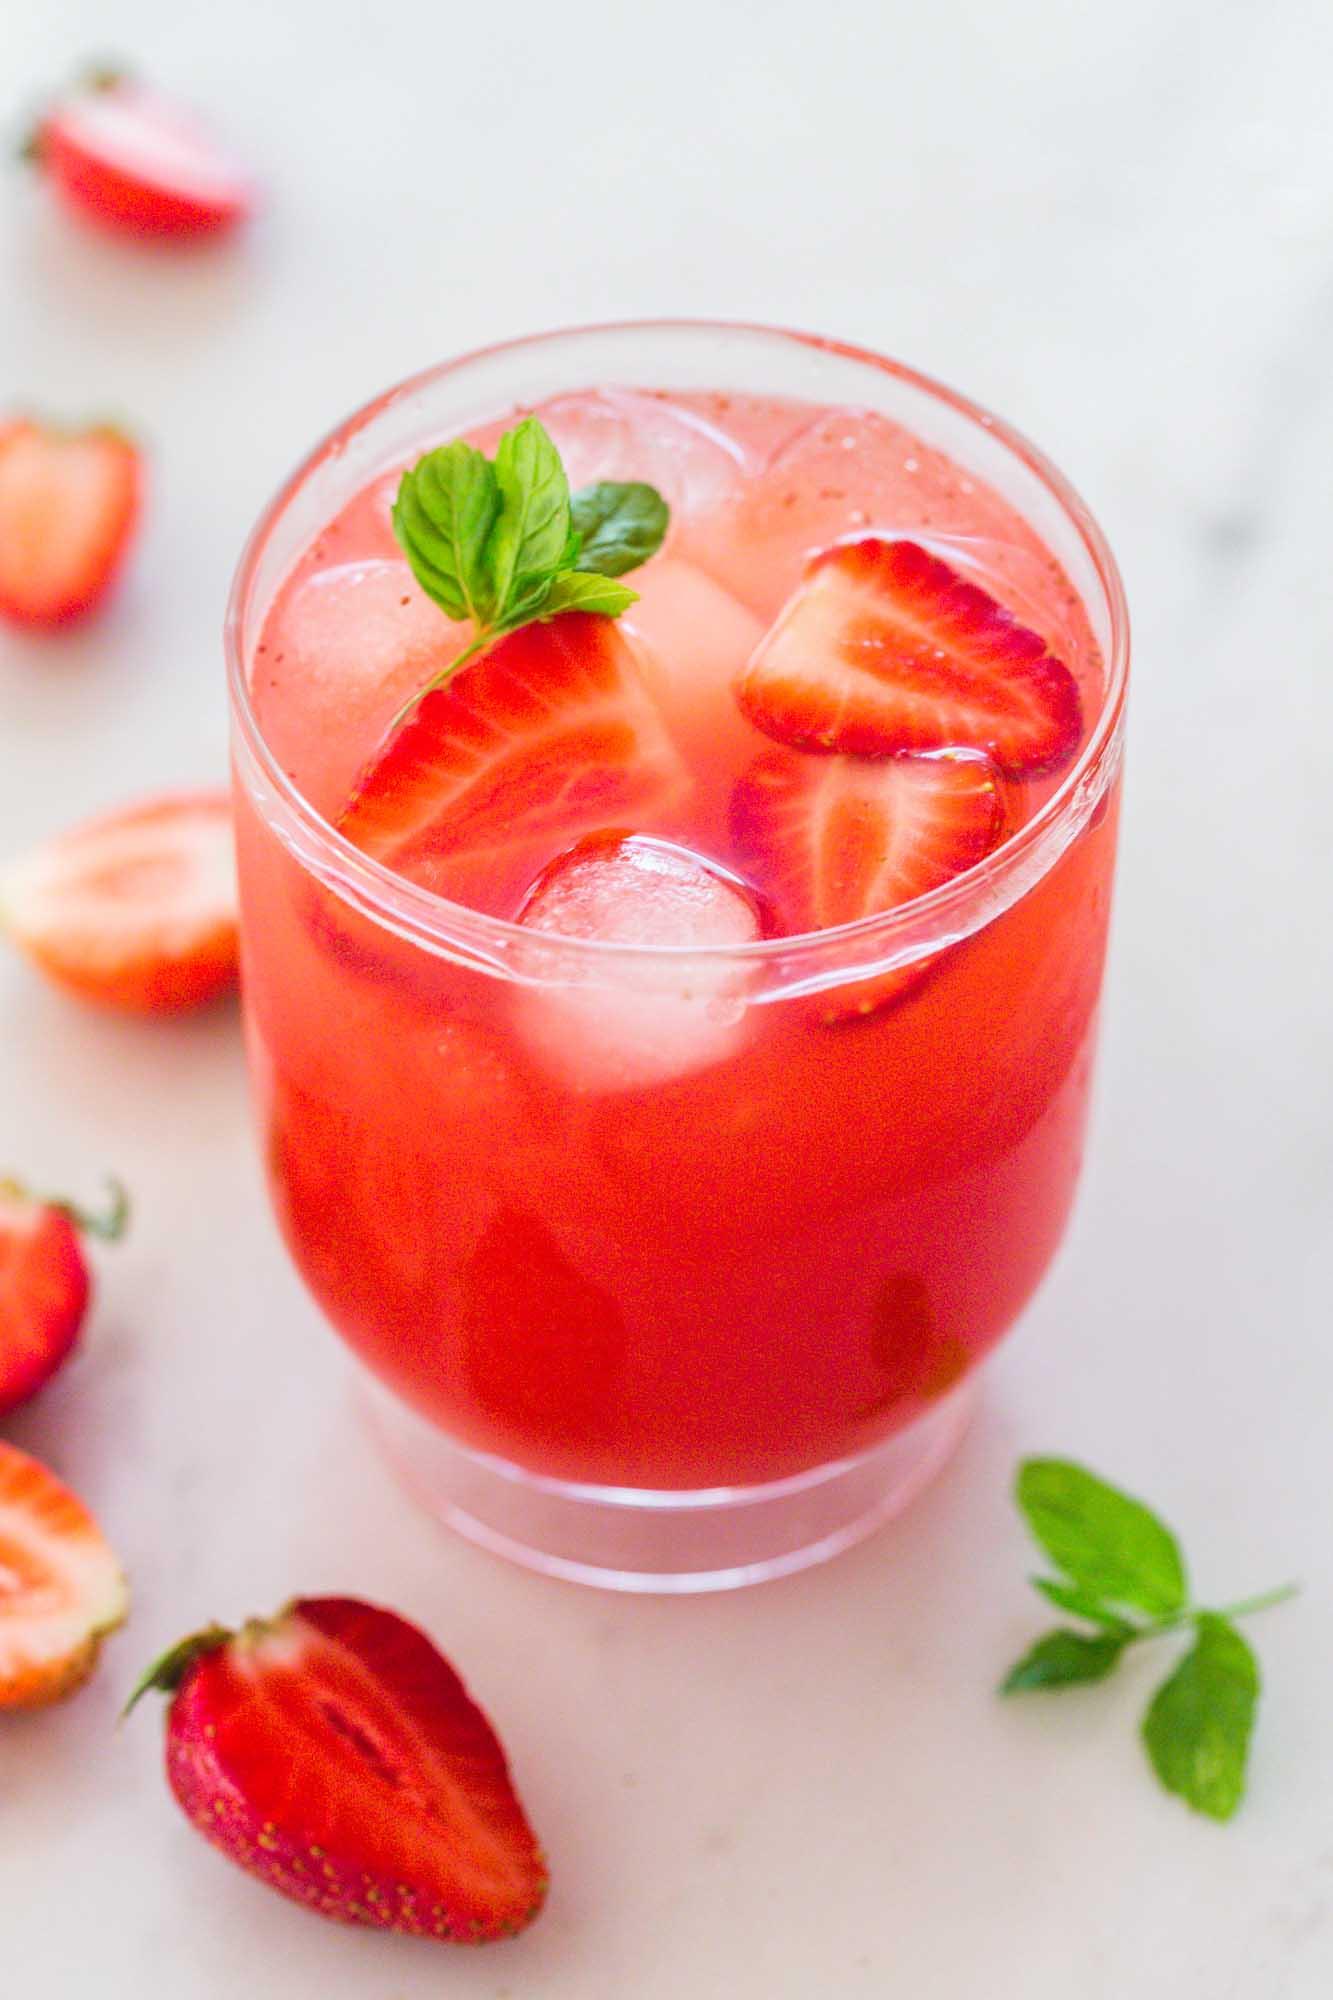 A glass of iced strawberry ice tea